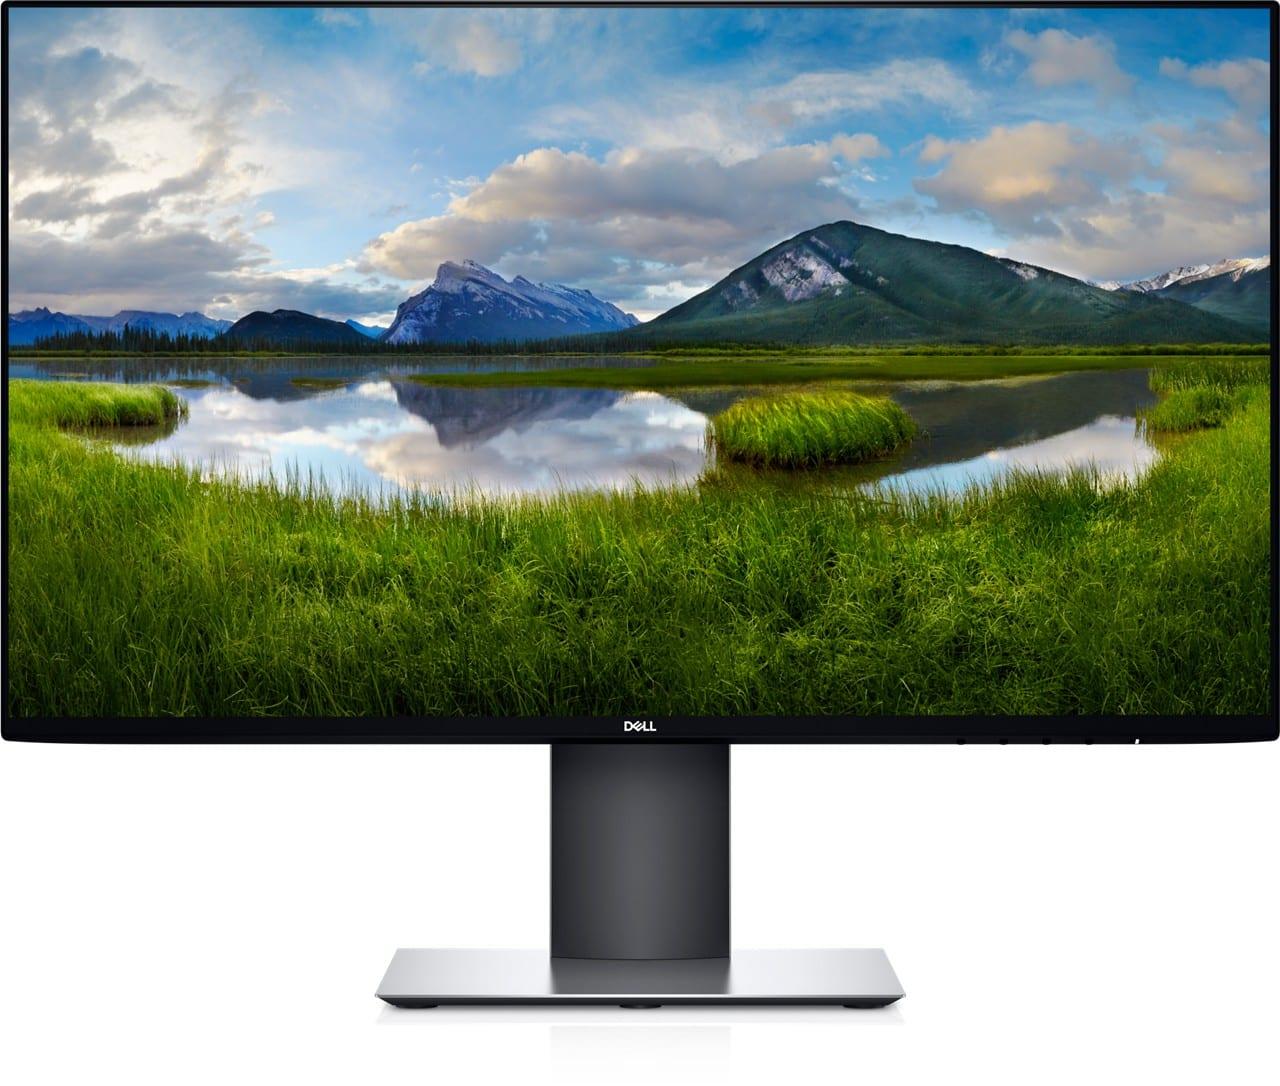 Monitor Dell UltraSharp 24 y 27 USB-C Hub.